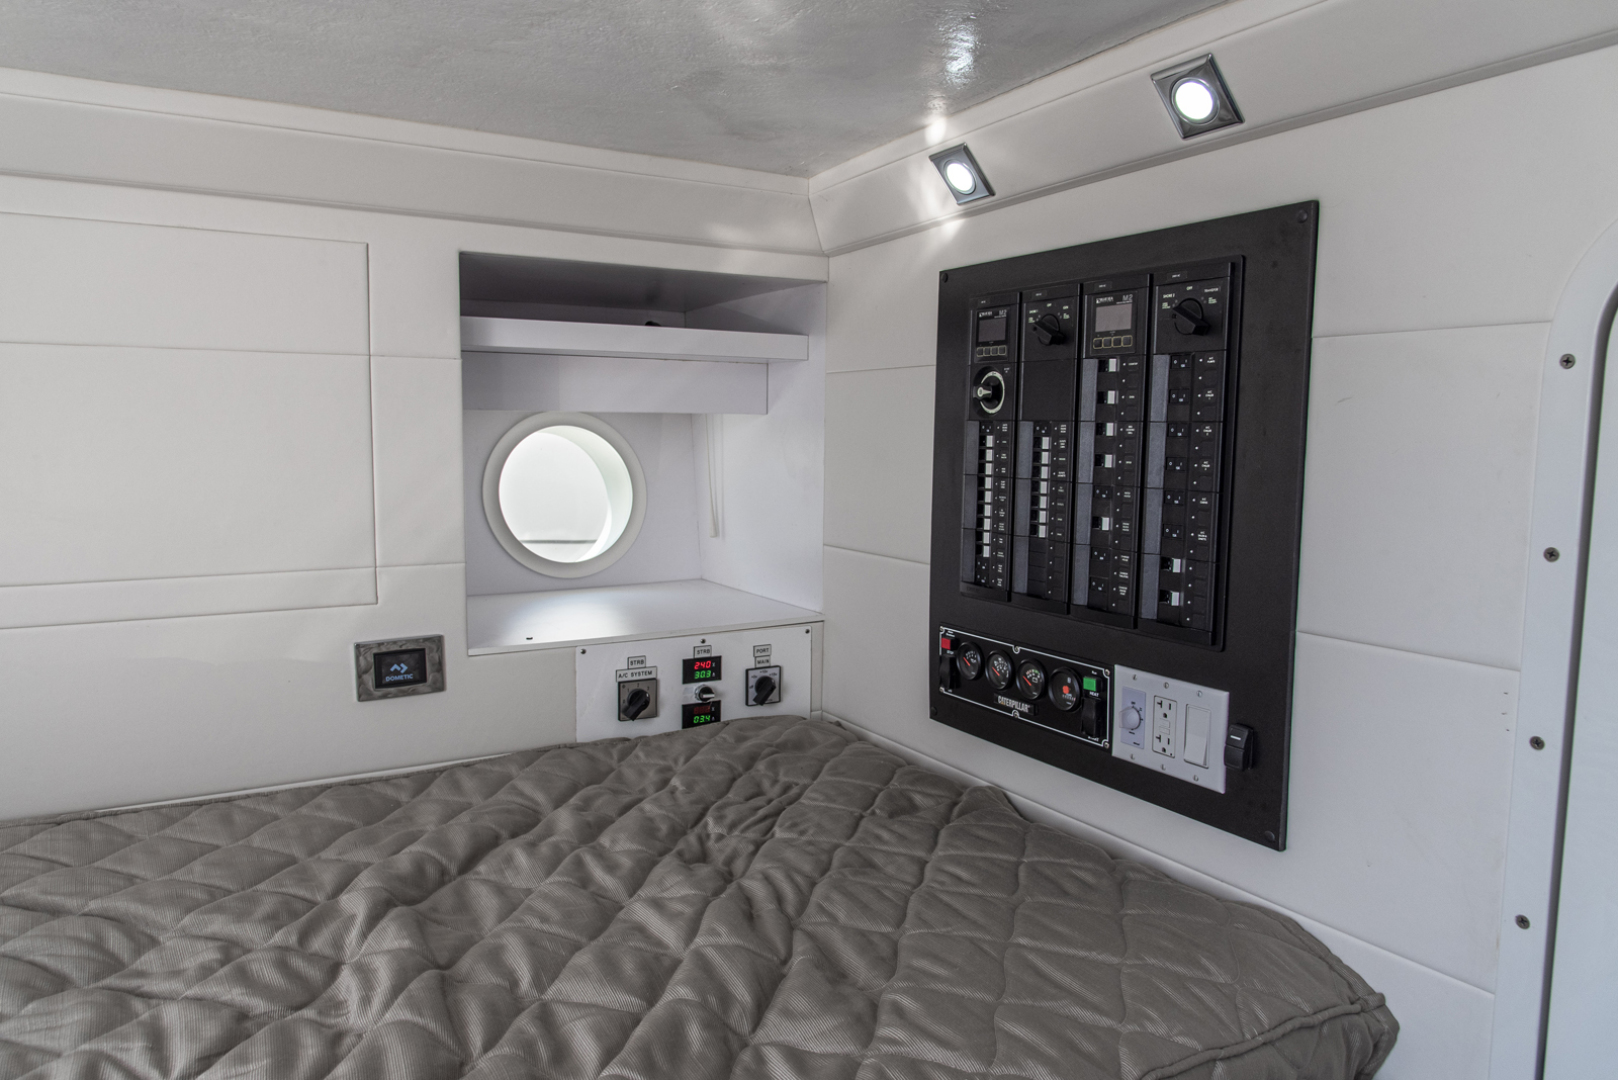 Neptunus-Motor Yacht Express 2018-LIQUID WISDOM Grand Haven-Michigan-United States-Crew area electric-1485017 | Thumbnail